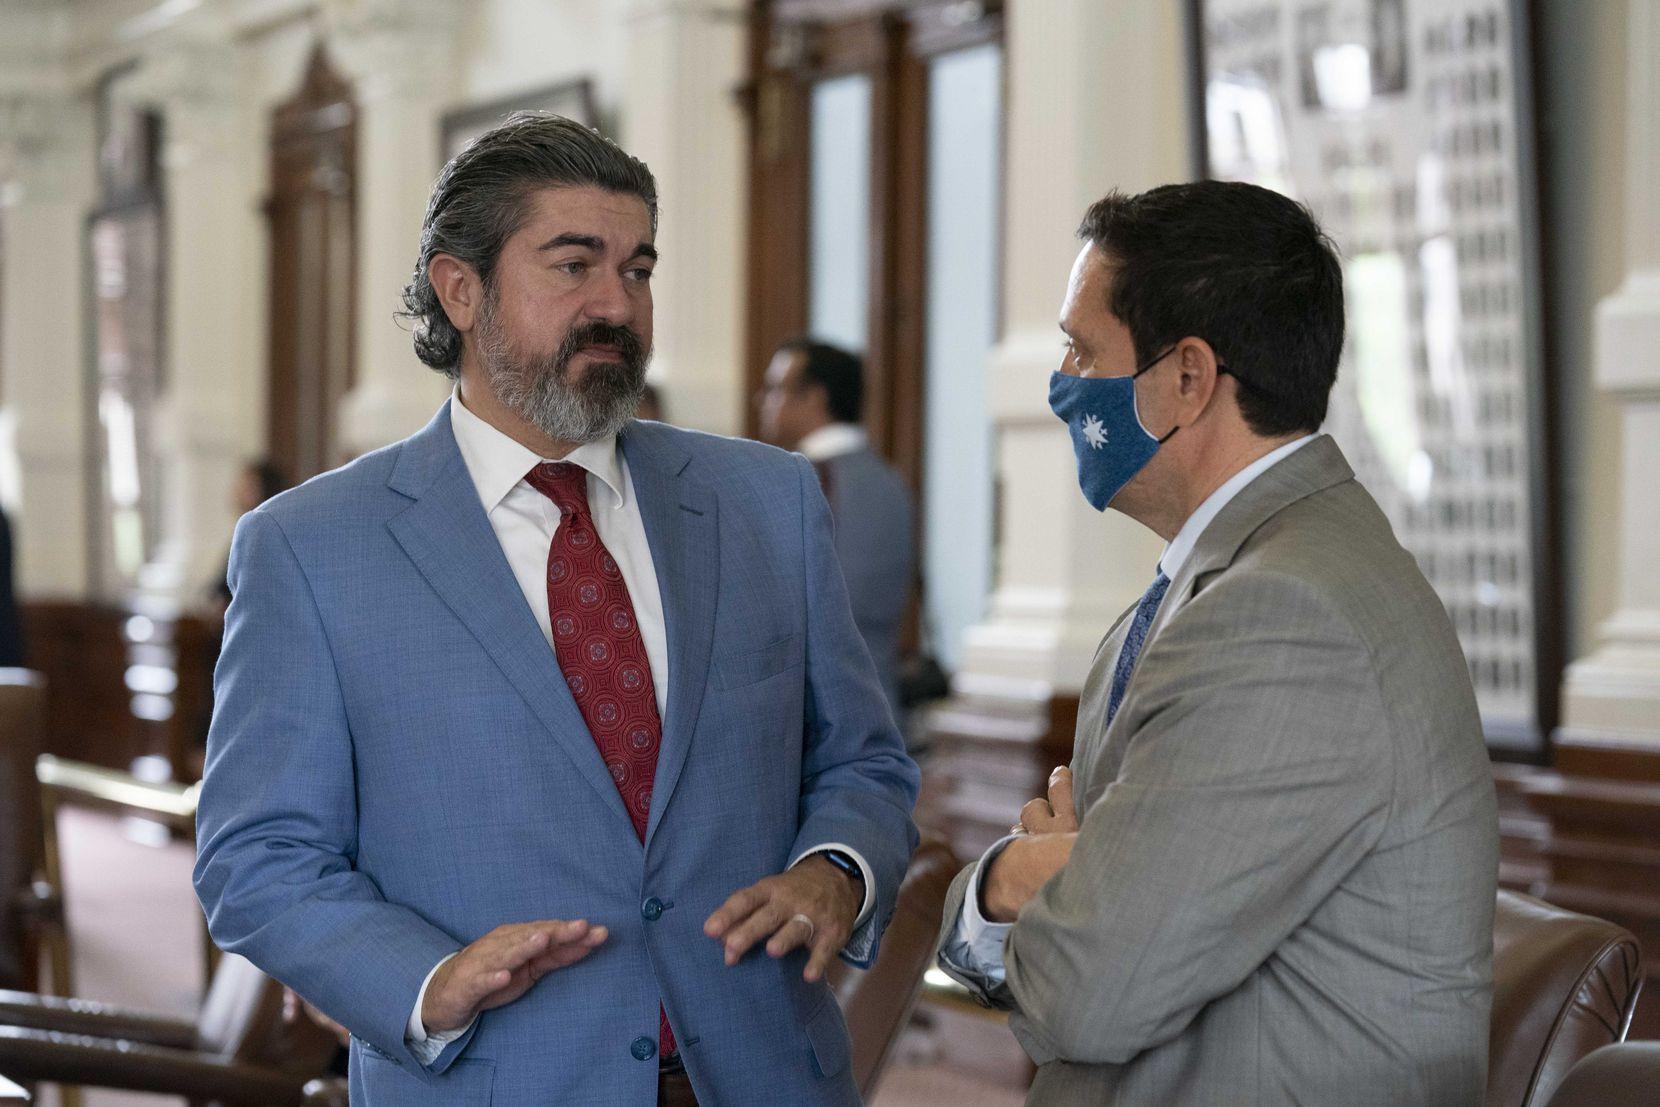 Rep. Eddie Rodriguez, D-Austin, (left) talked with Rep. Trey Martinez Fischer, D-San Antonio, on the final day to pass bills in the 87th Texas Legislature.